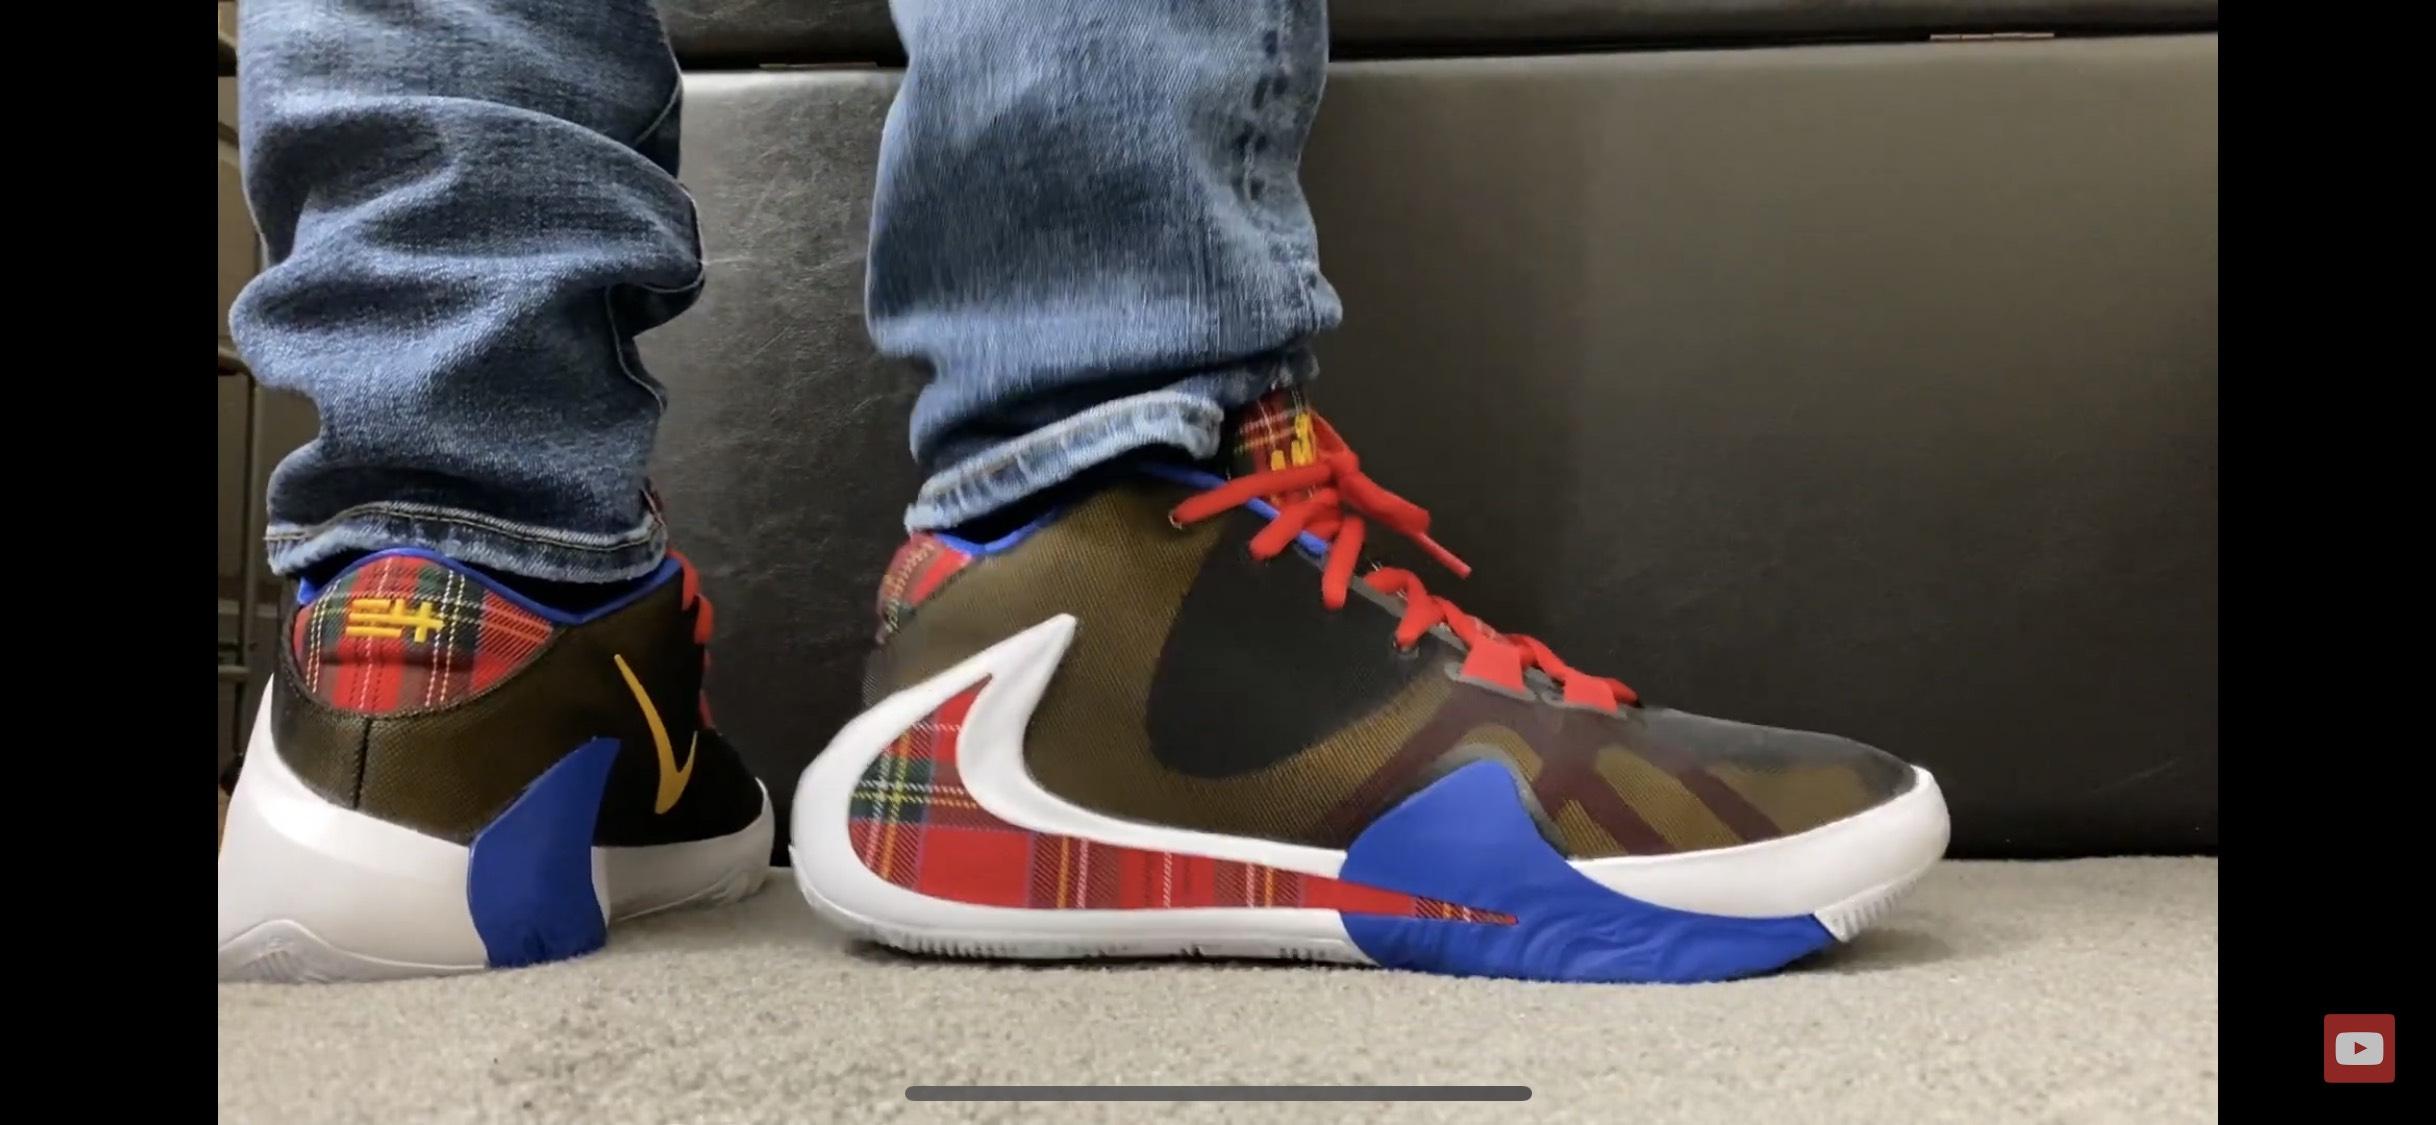 Nike: Zoom freak 1 Empleado del mes.